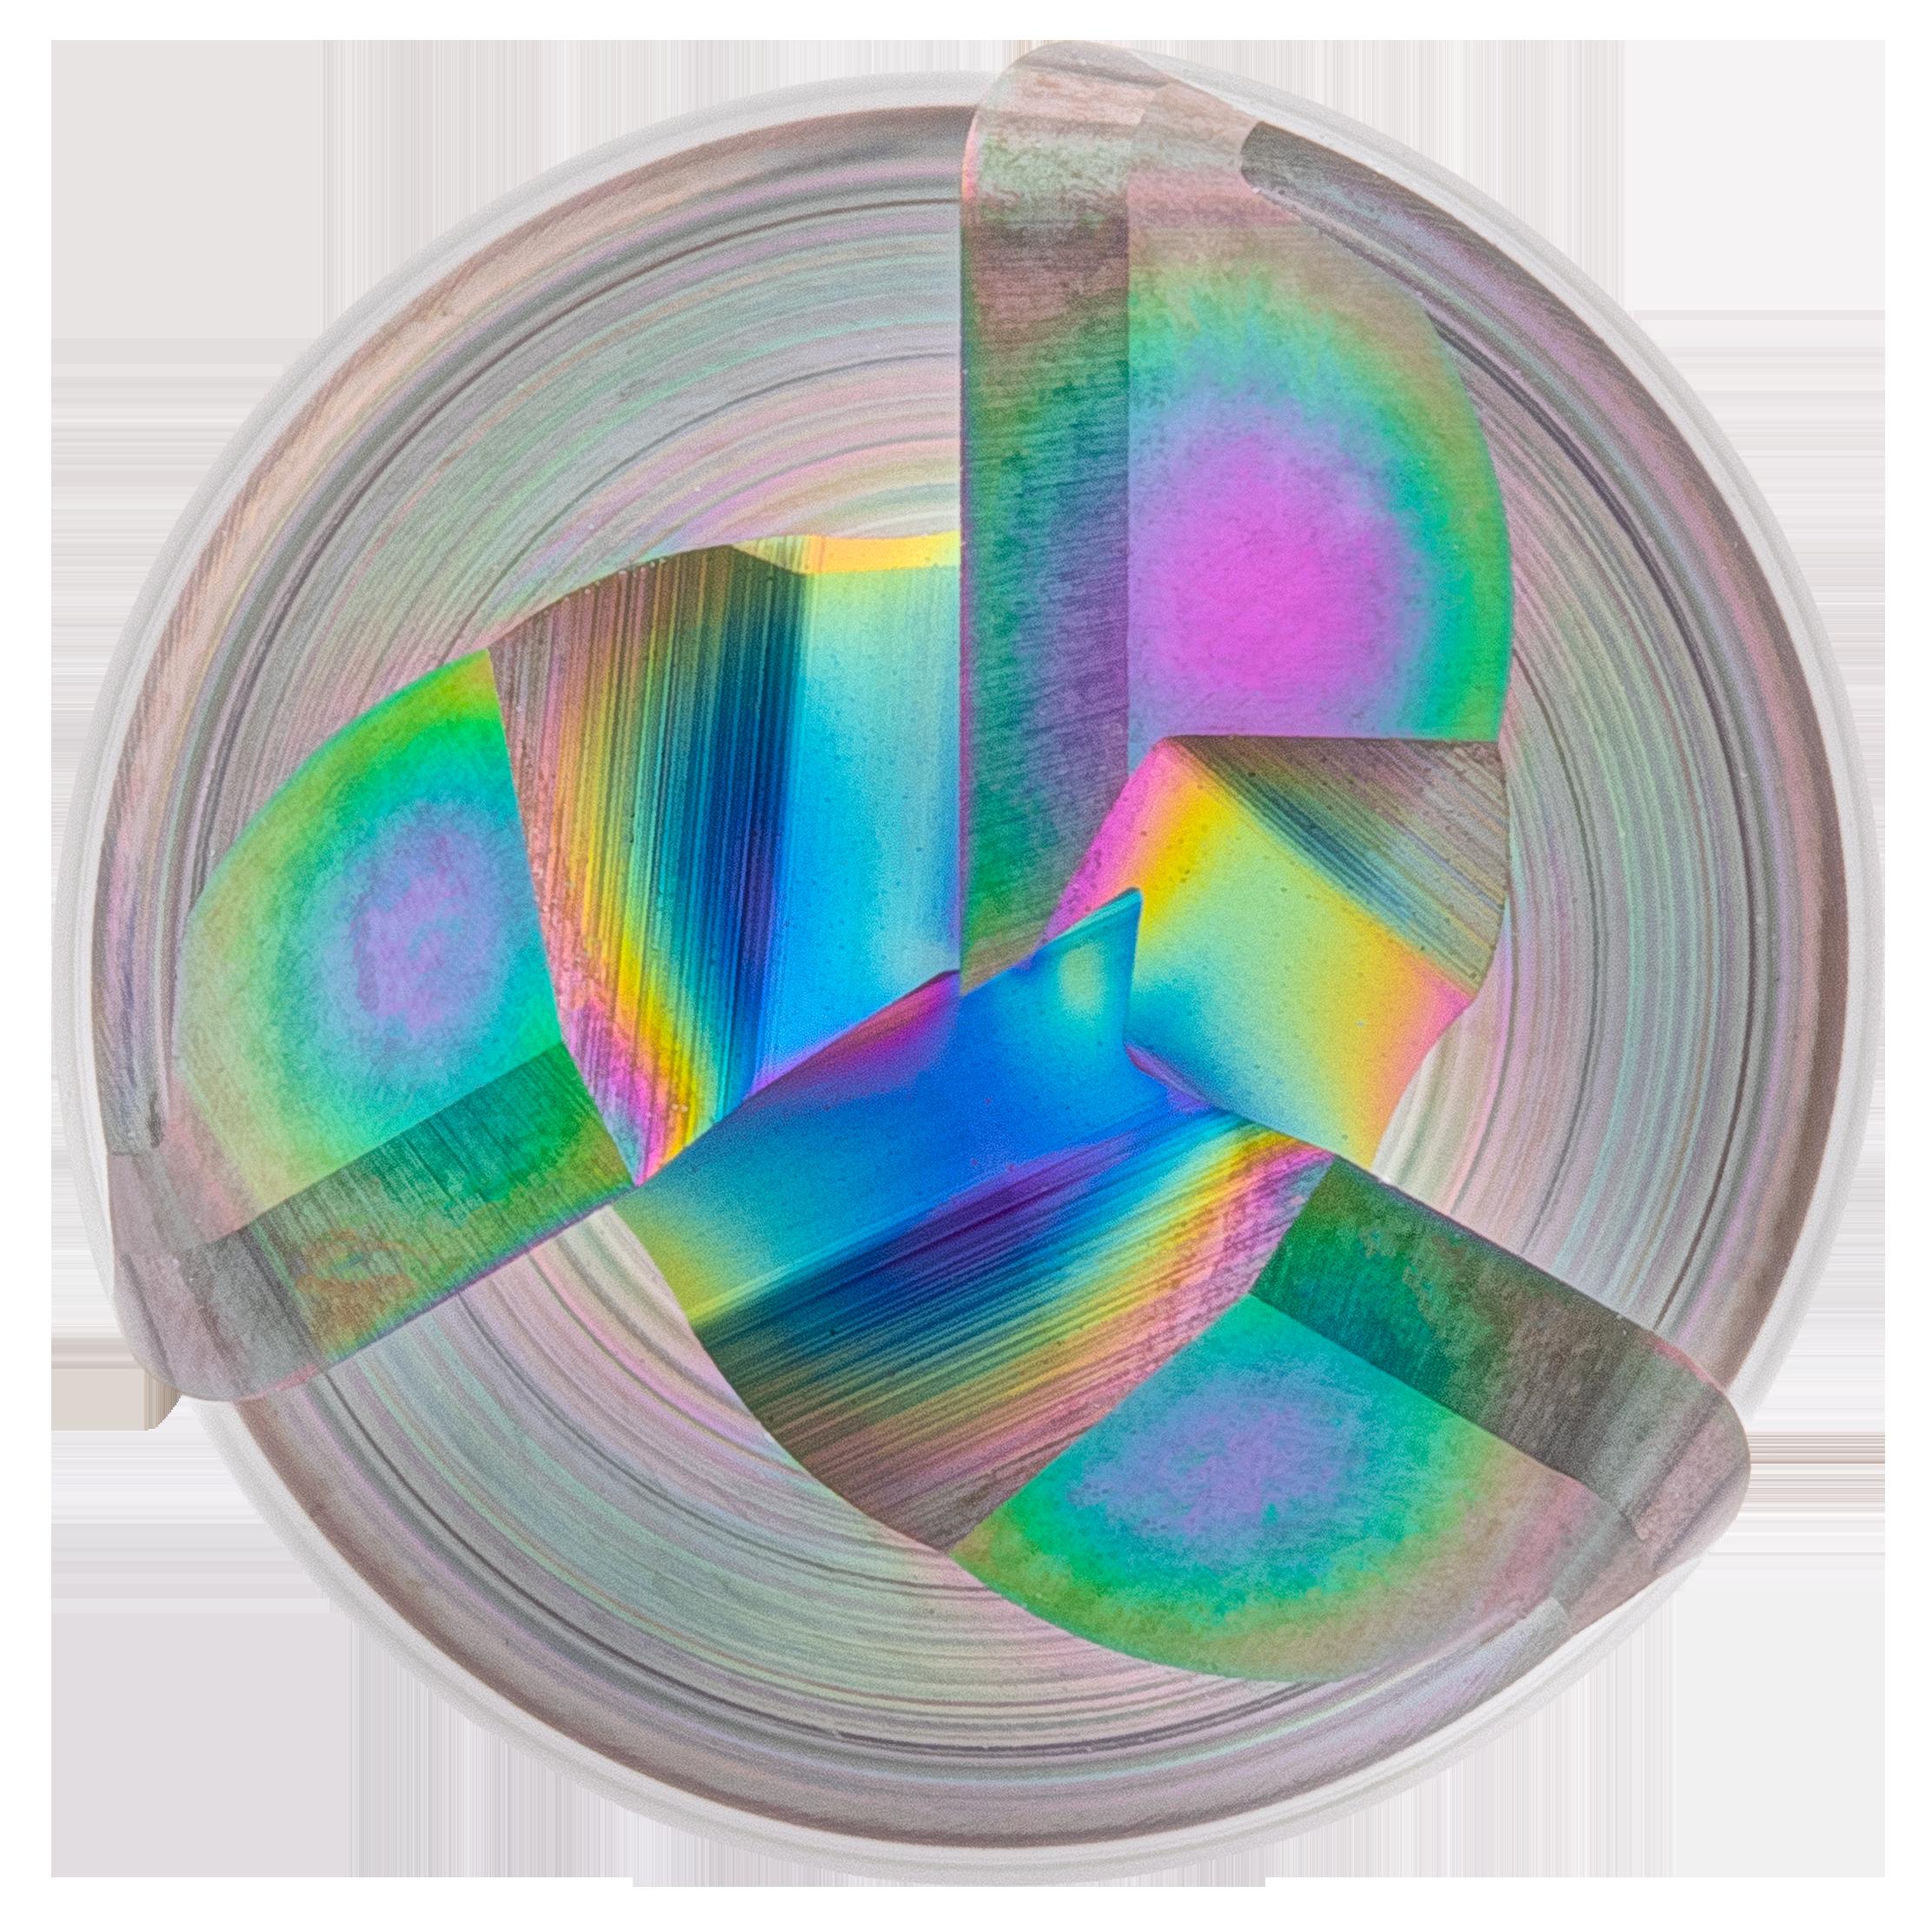 EXN1-M06-0003